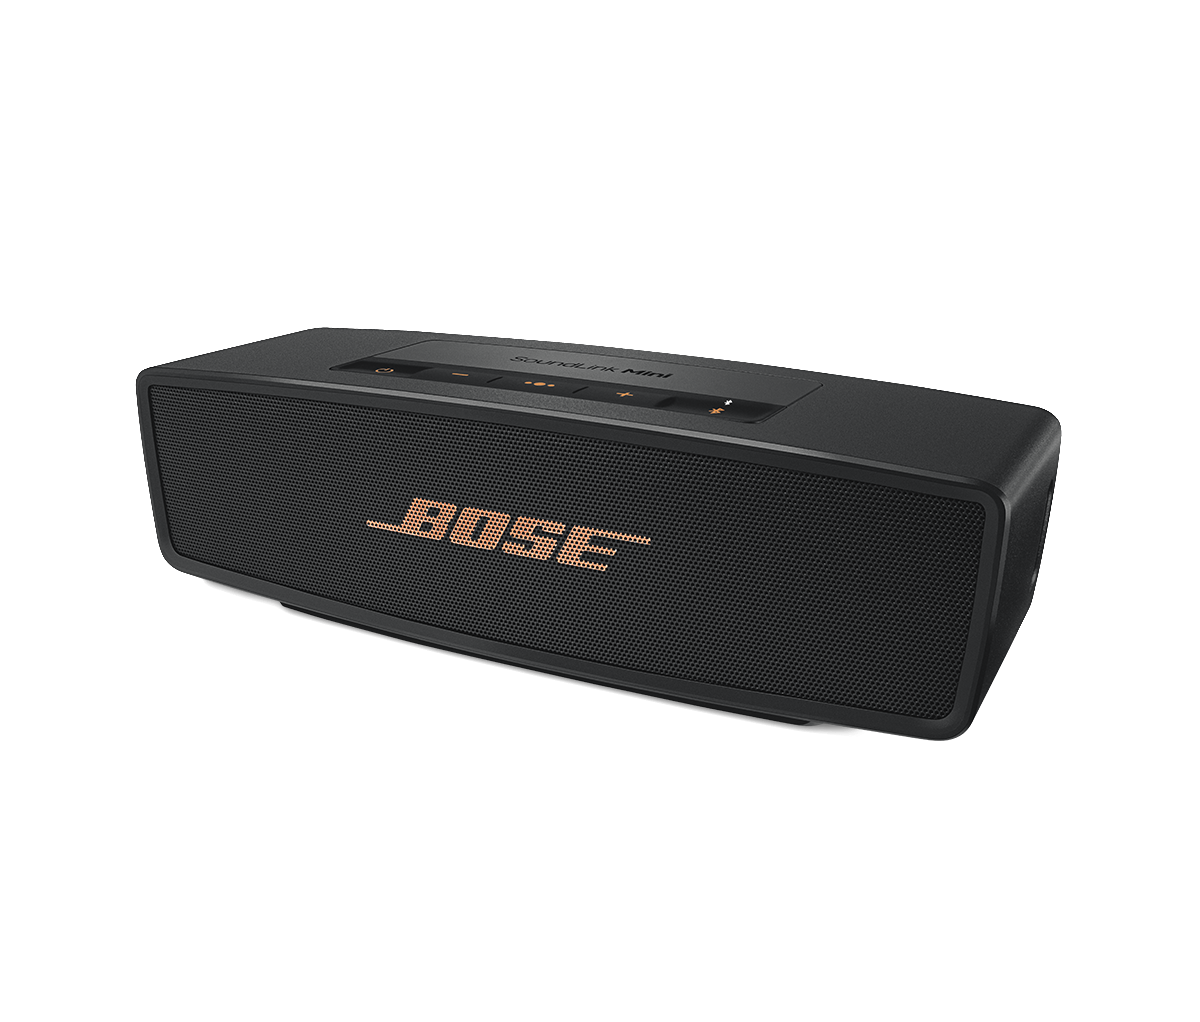 Bose SoundLink Mini II, Black 749485-1710